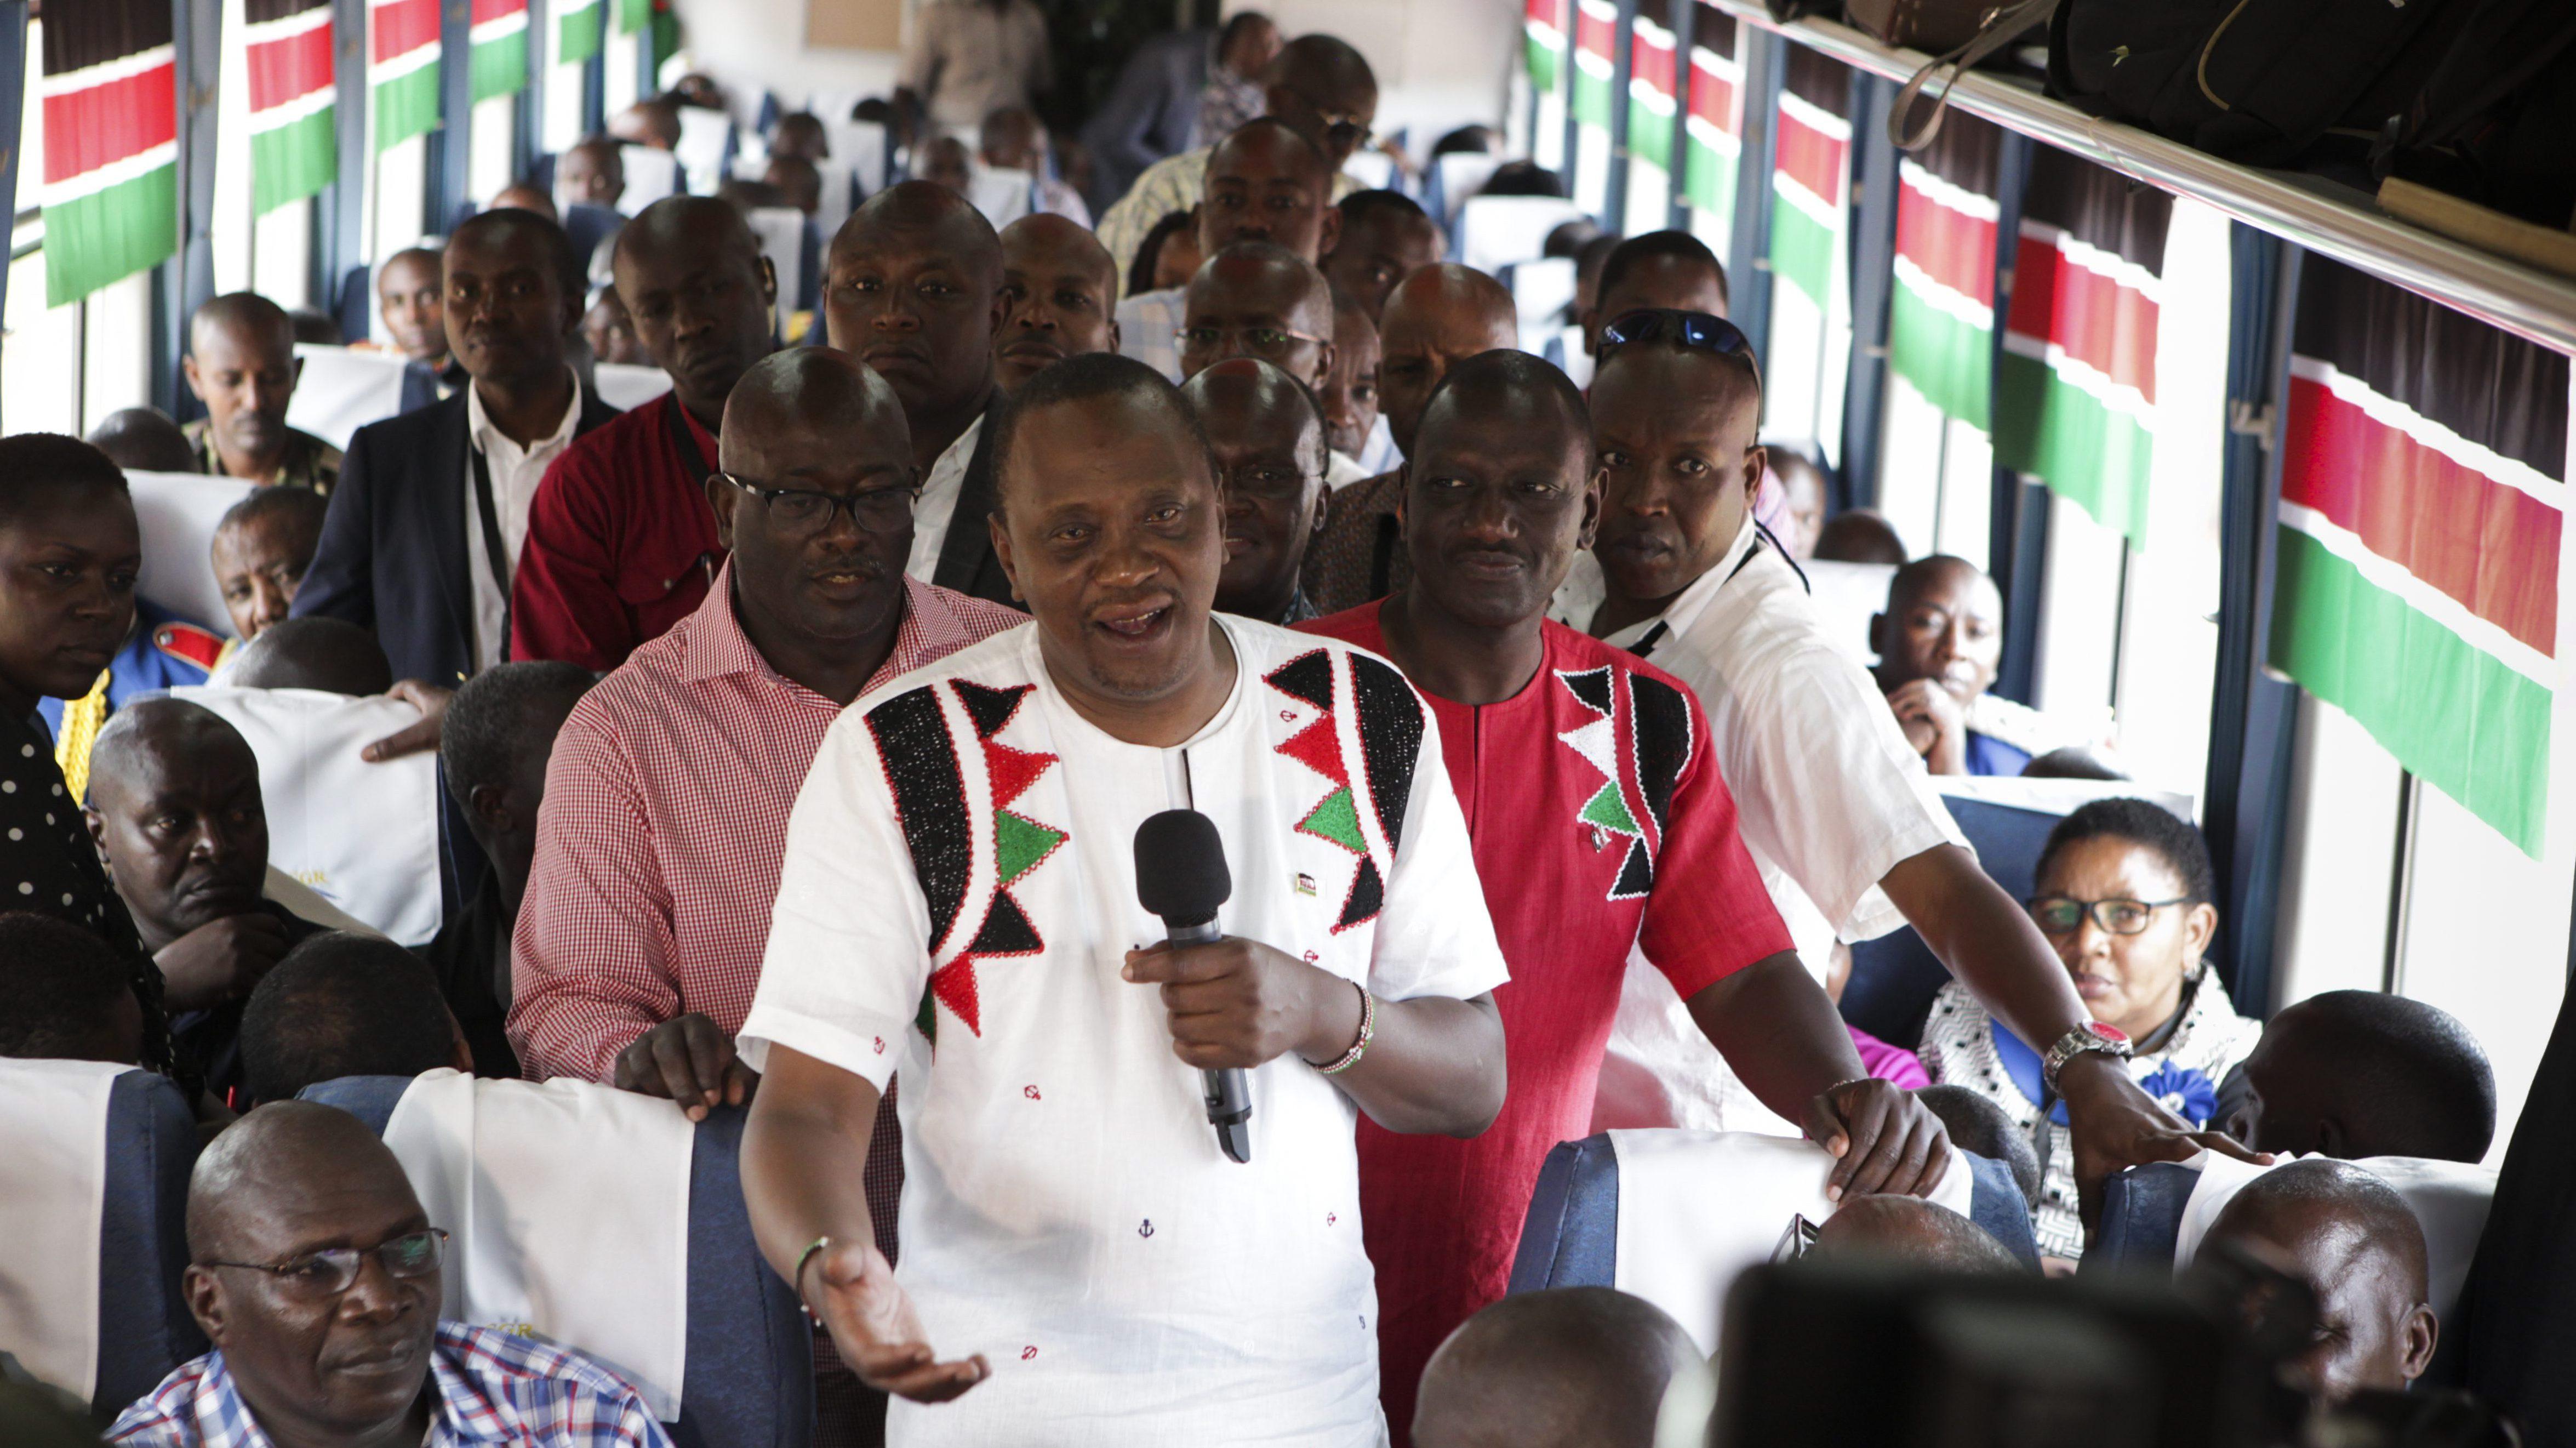 Kenyan president Uhuru Kenyatta, with his deputy president William Ruto, addresses a passenger train on the Standard Gauge Railway.